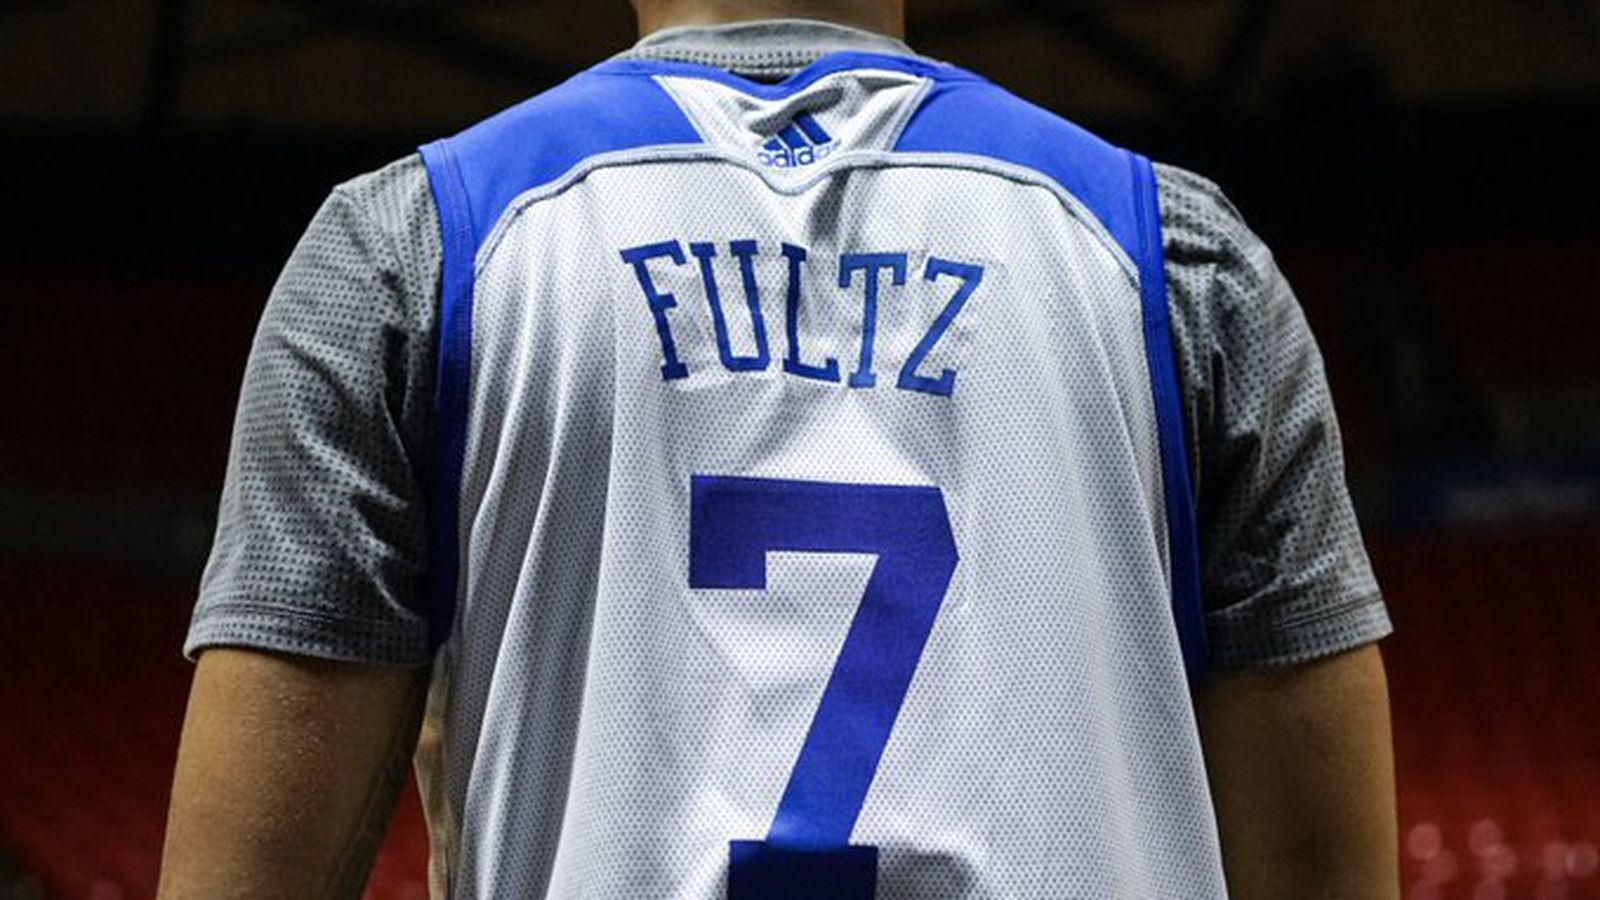 Fultz_7.0